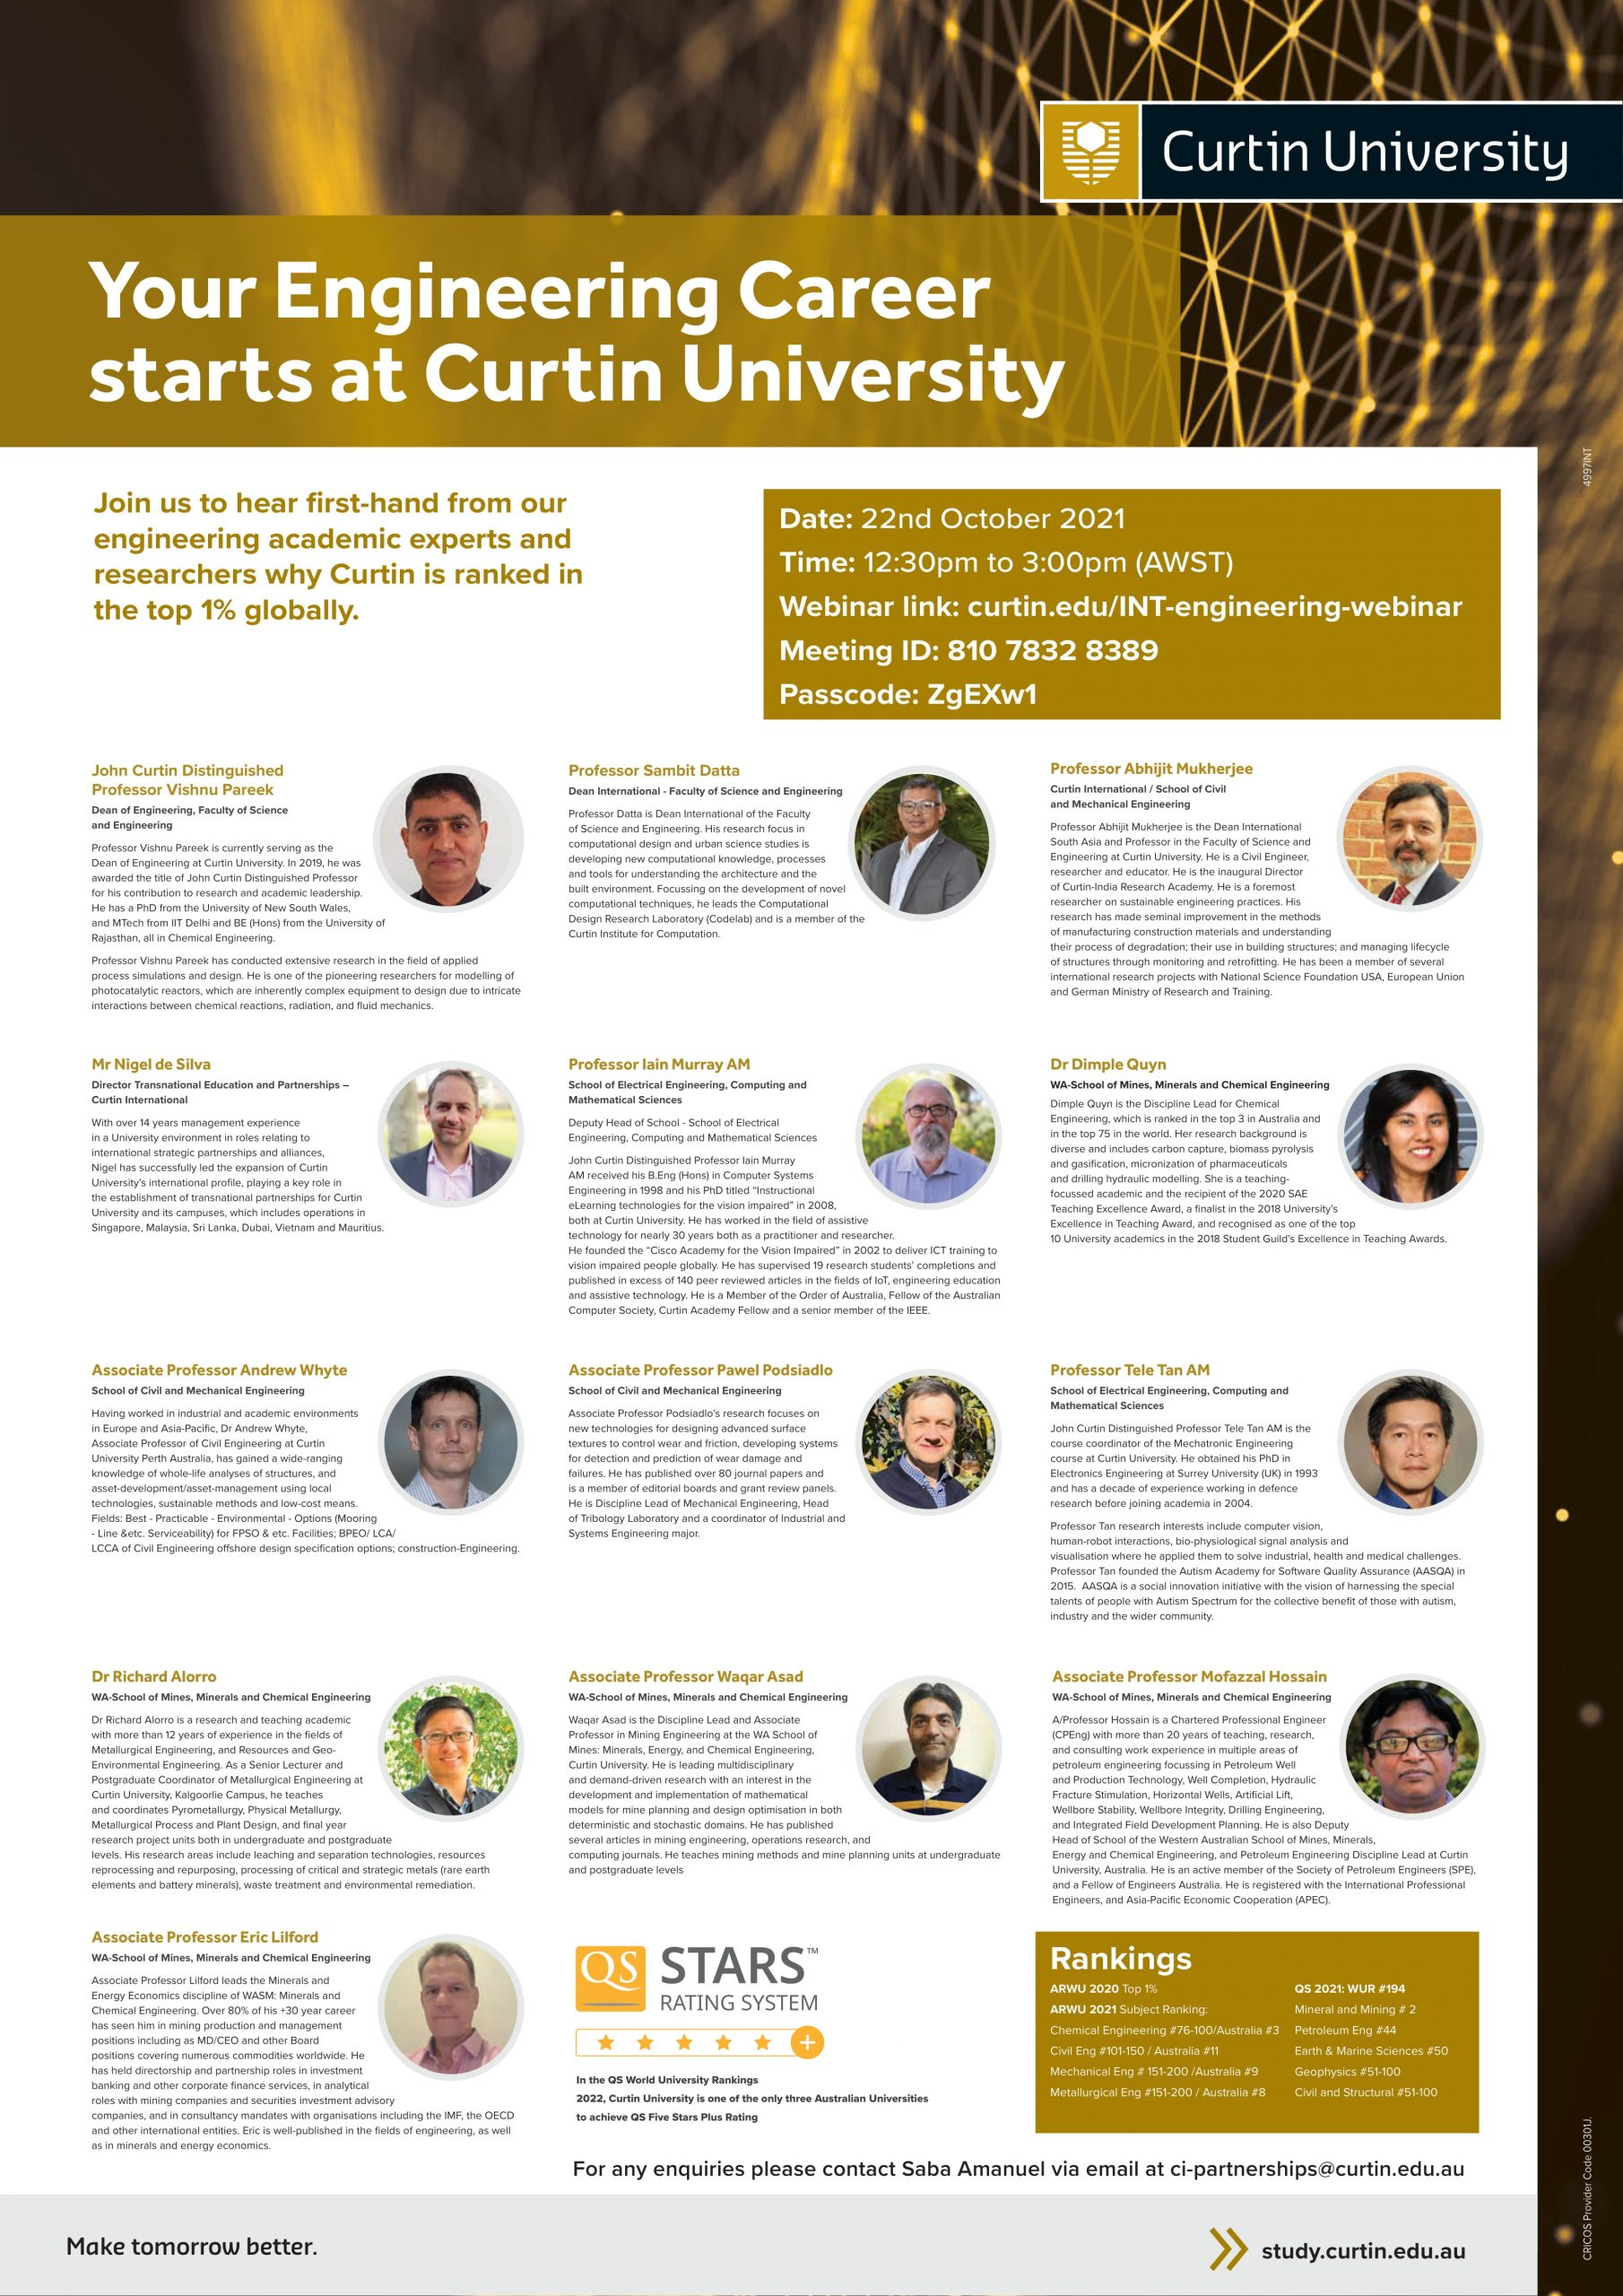 Curtin University Invitation for Engineering Webinar